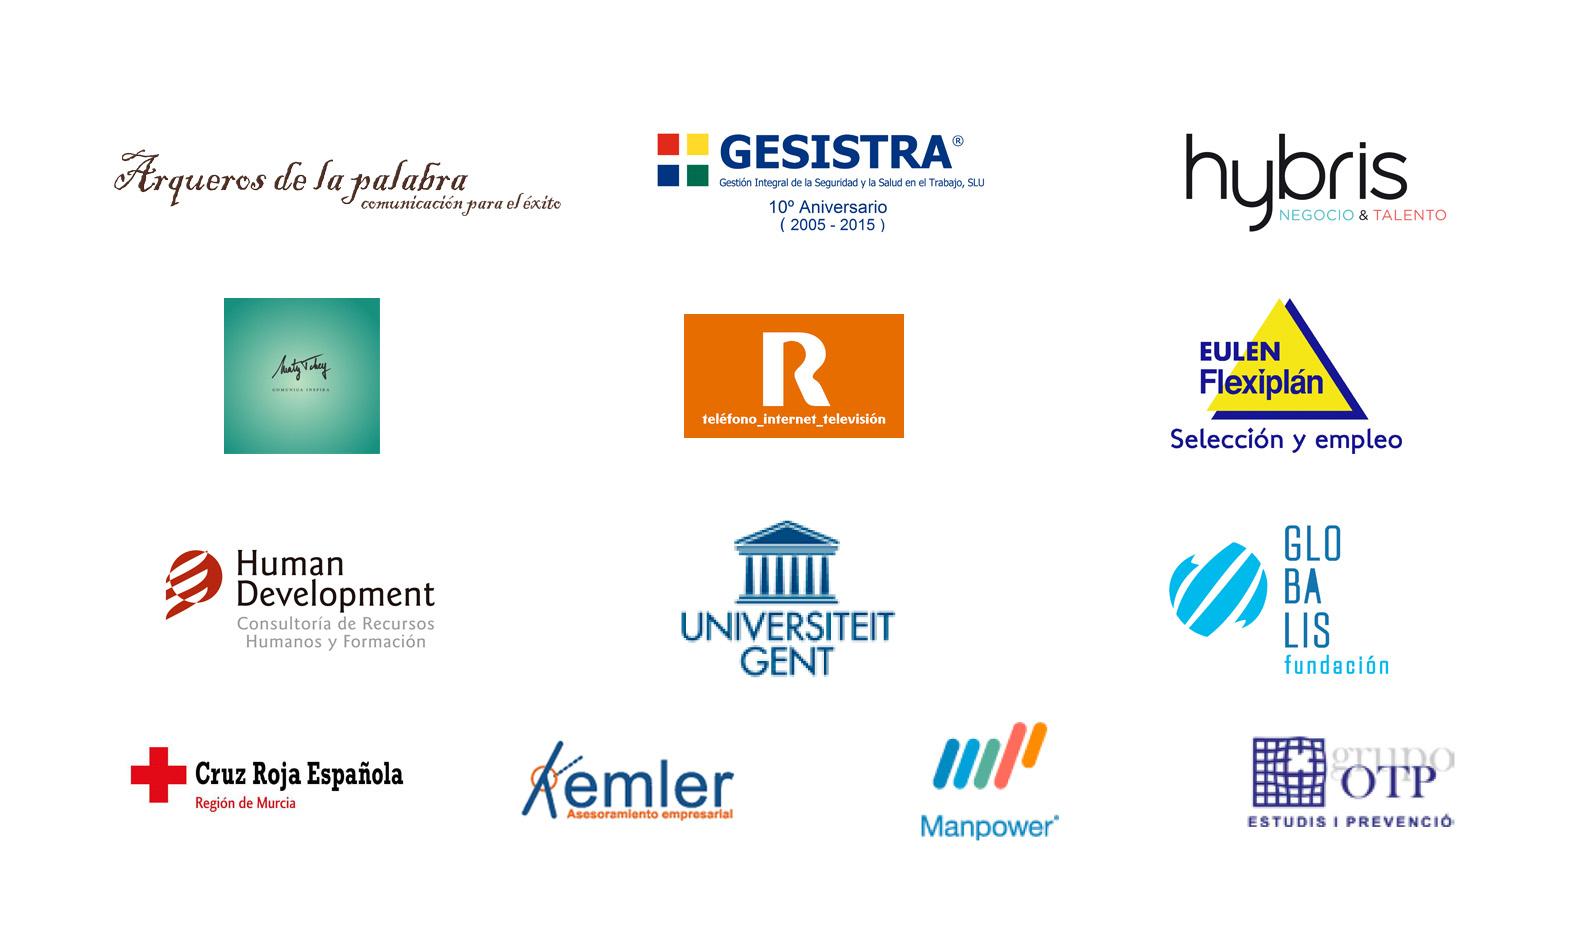 logotipos empresas colaboradoras: Arqueros de la Palabra, Maty Tchey, OTP, Manpower, Universidad de Gent, R, Eulen Flexiplan, Human Development, Hybris, Cruz Roja, Gesistra, Kemler, GLobalis